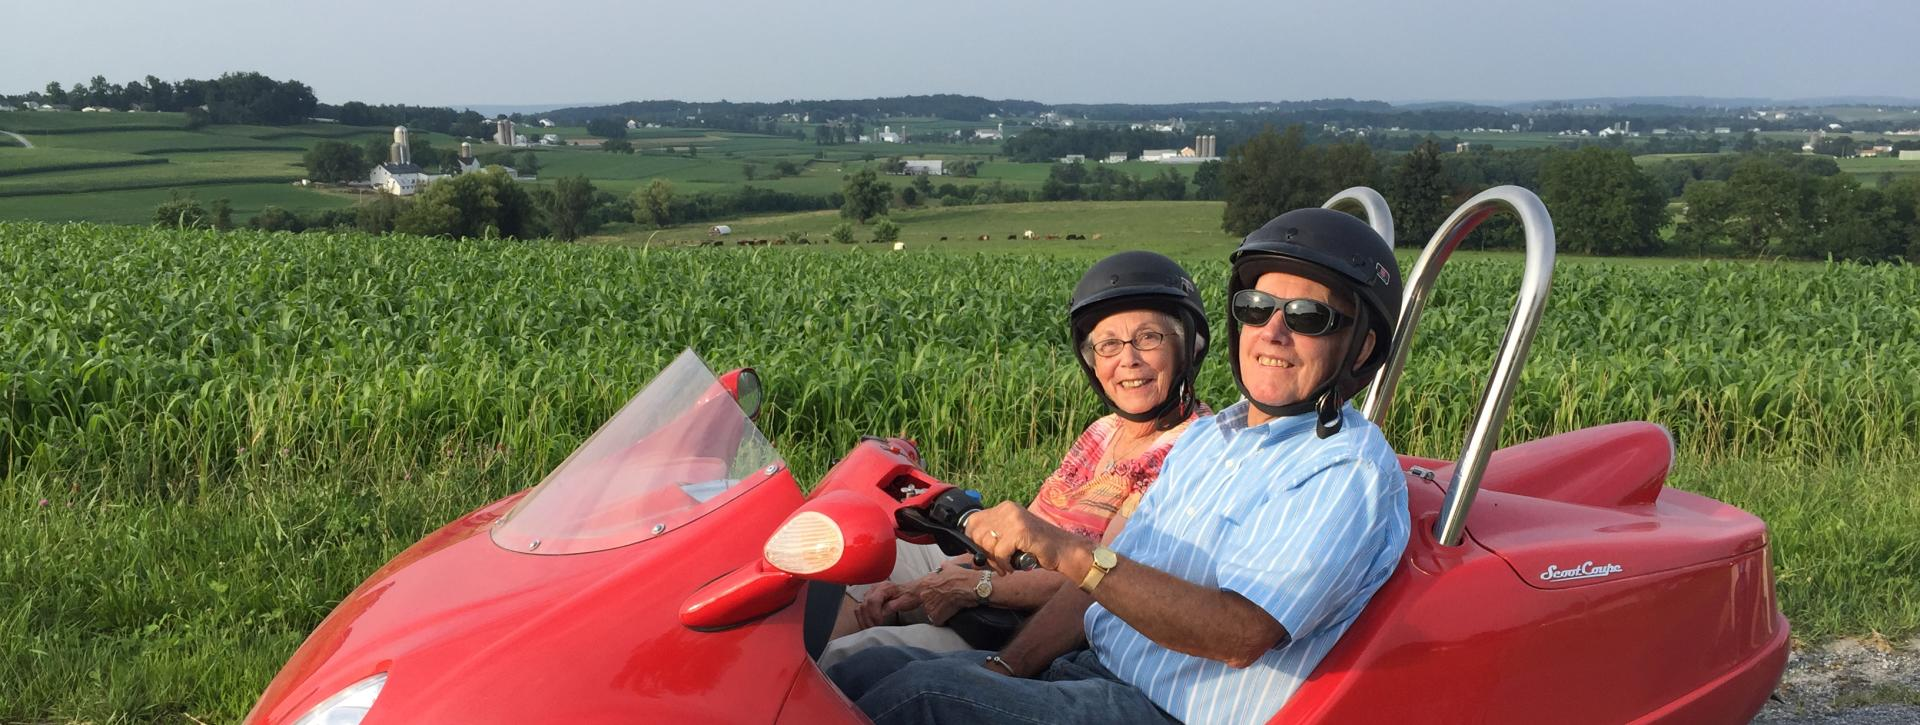 strasburg-scooters